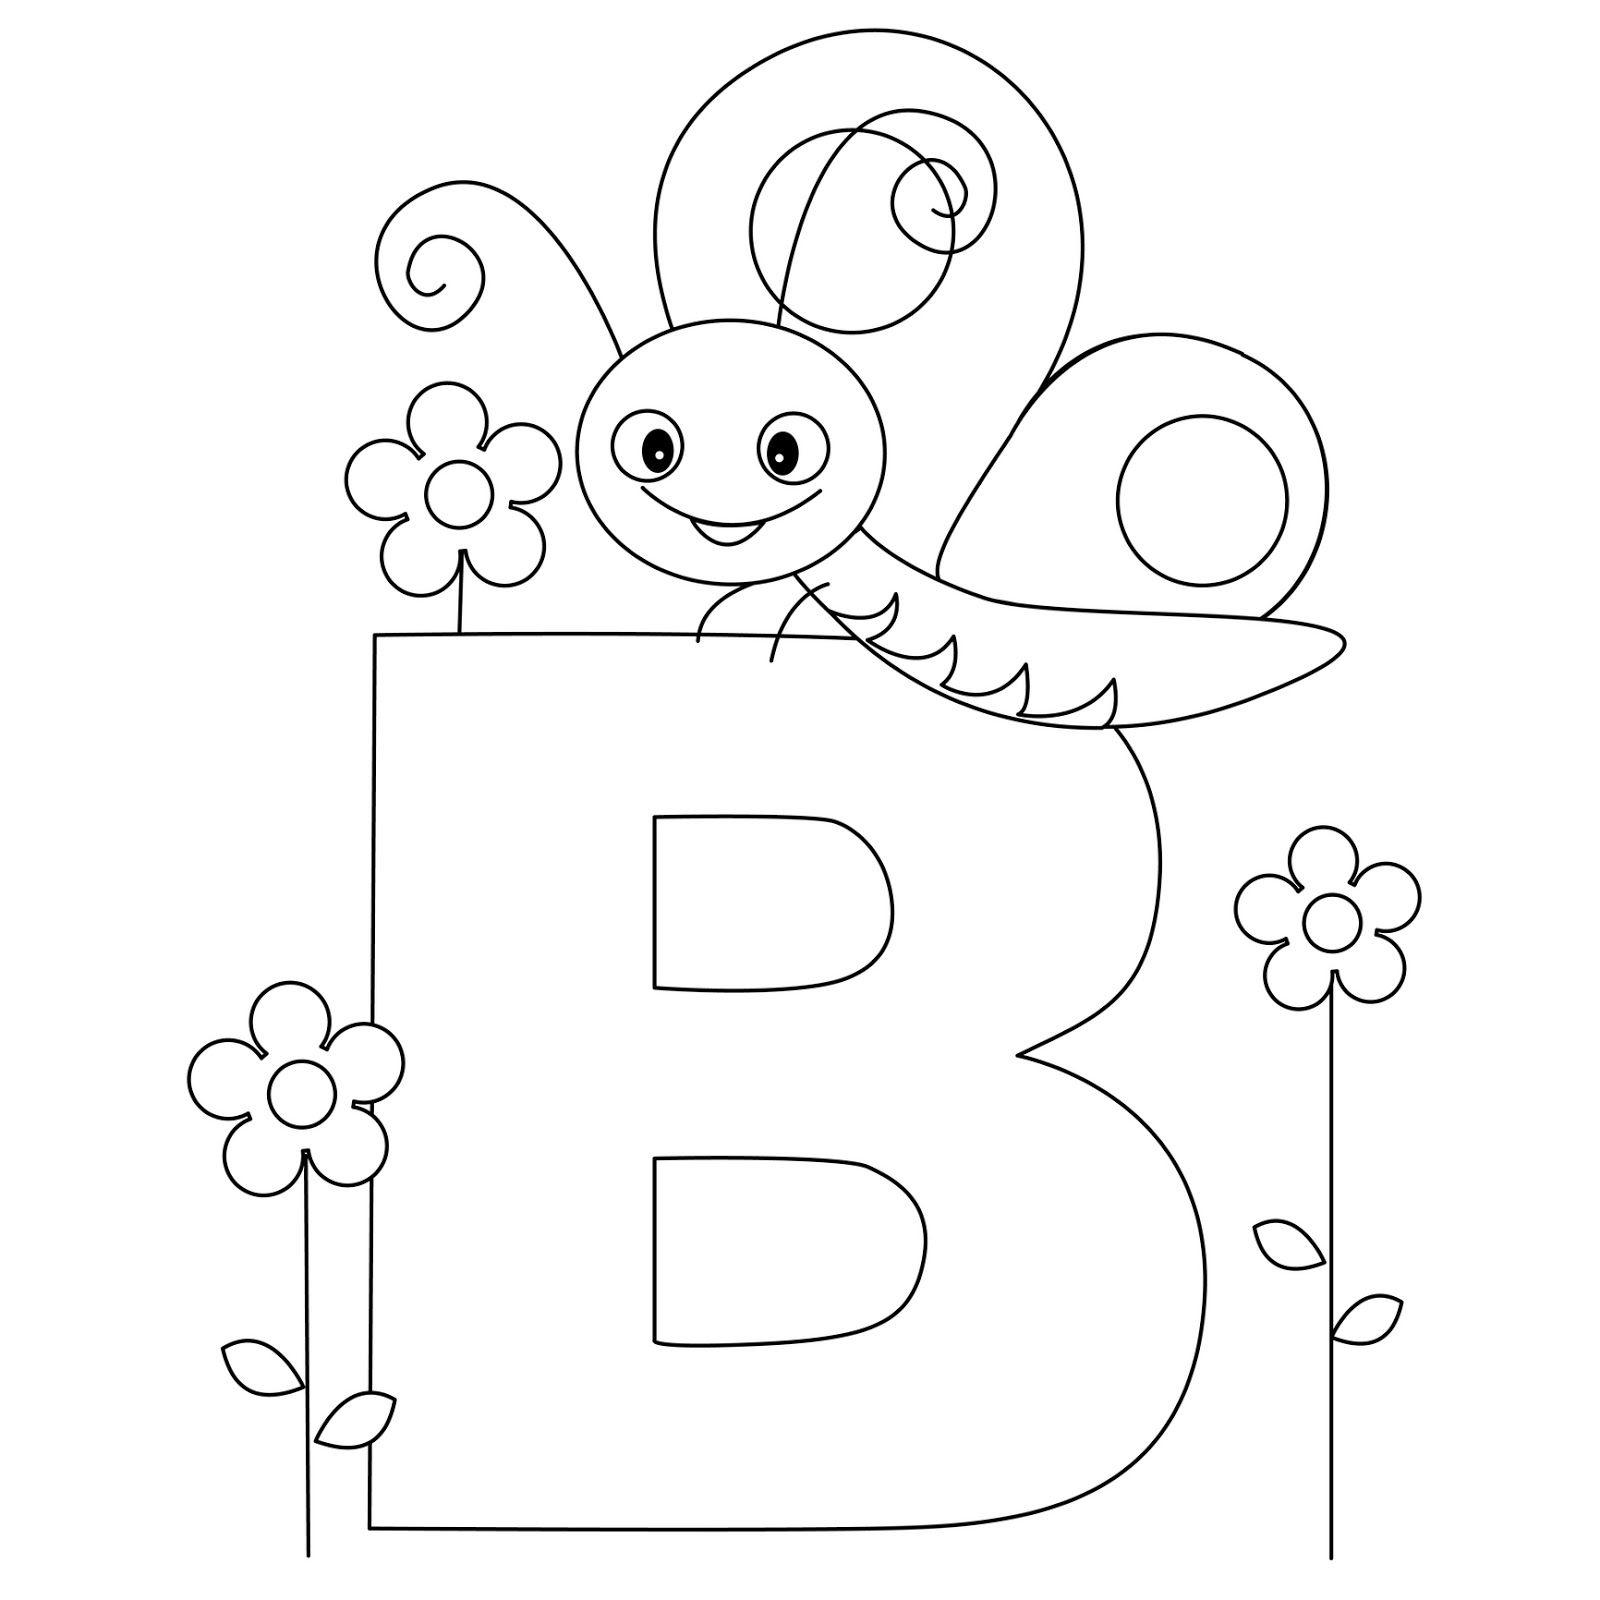 Animal-Alphabet-Letter-B1.jpeg (1600×1600)   drawings   Pinterest ...